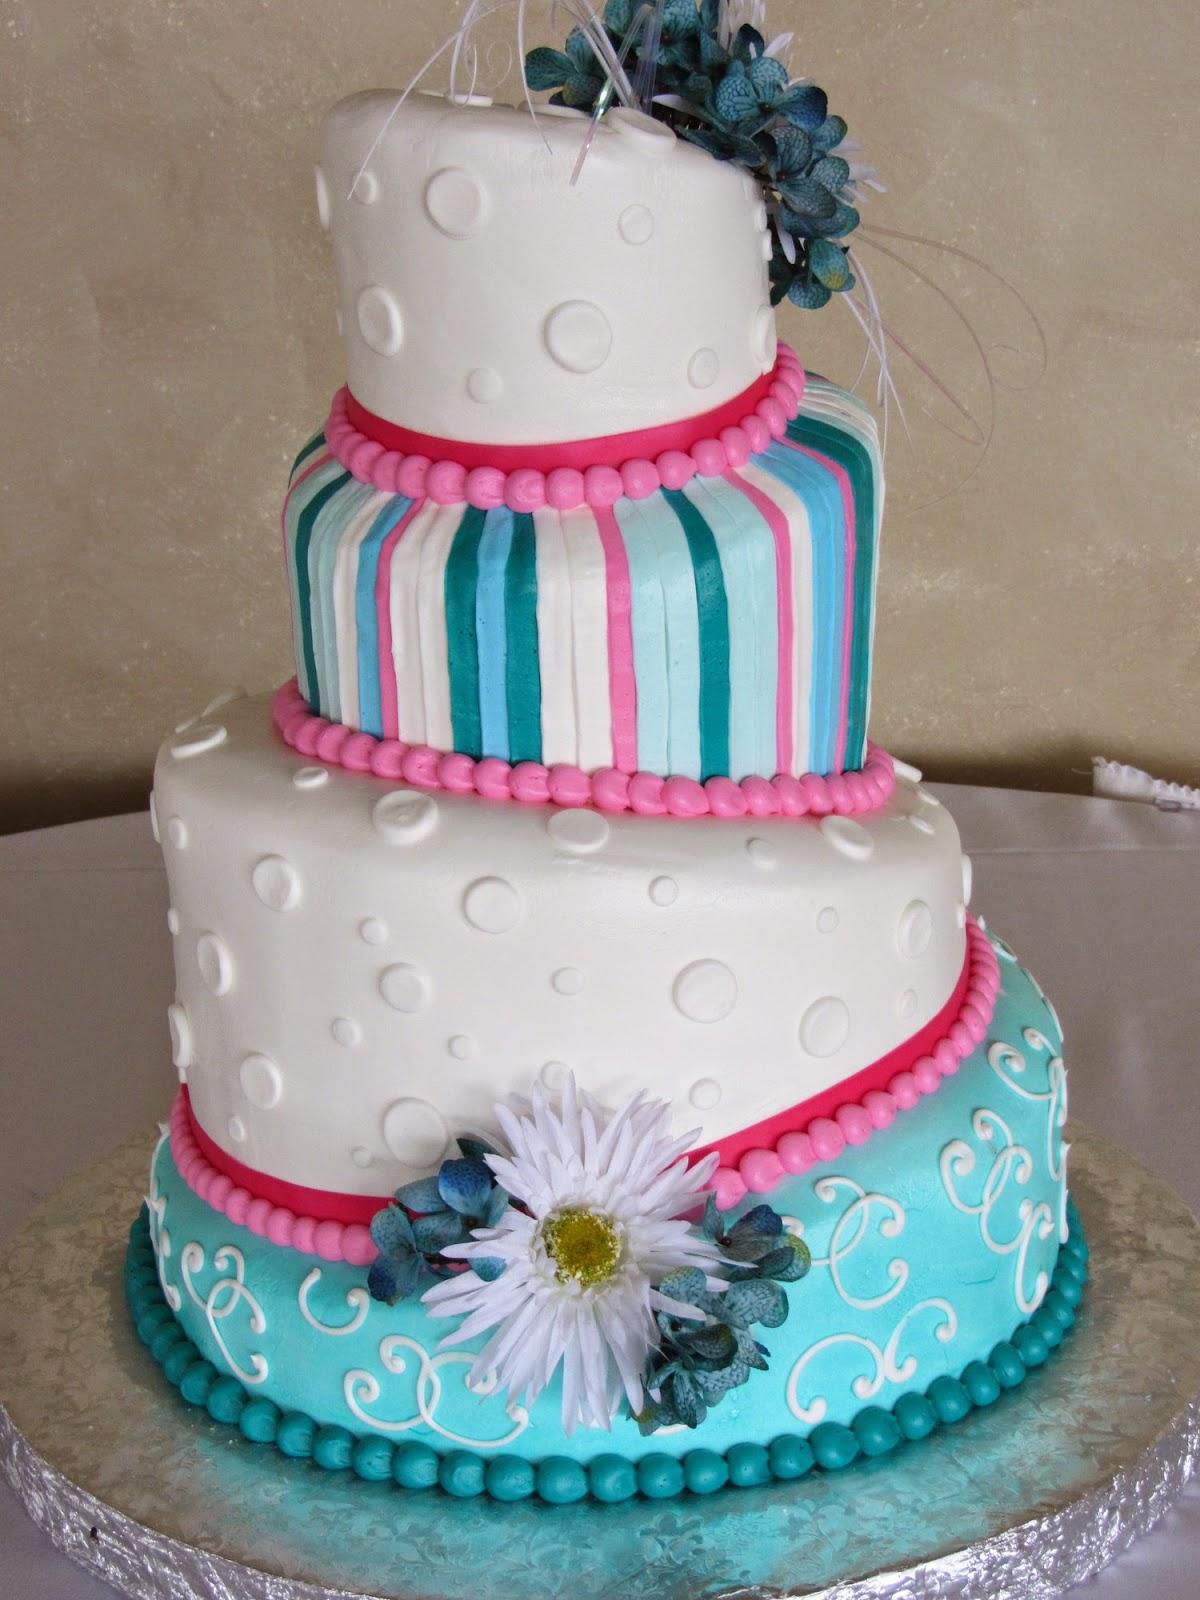 Creative Cake Designs Wallpaper 2015 Beautiful Homemade Cakes